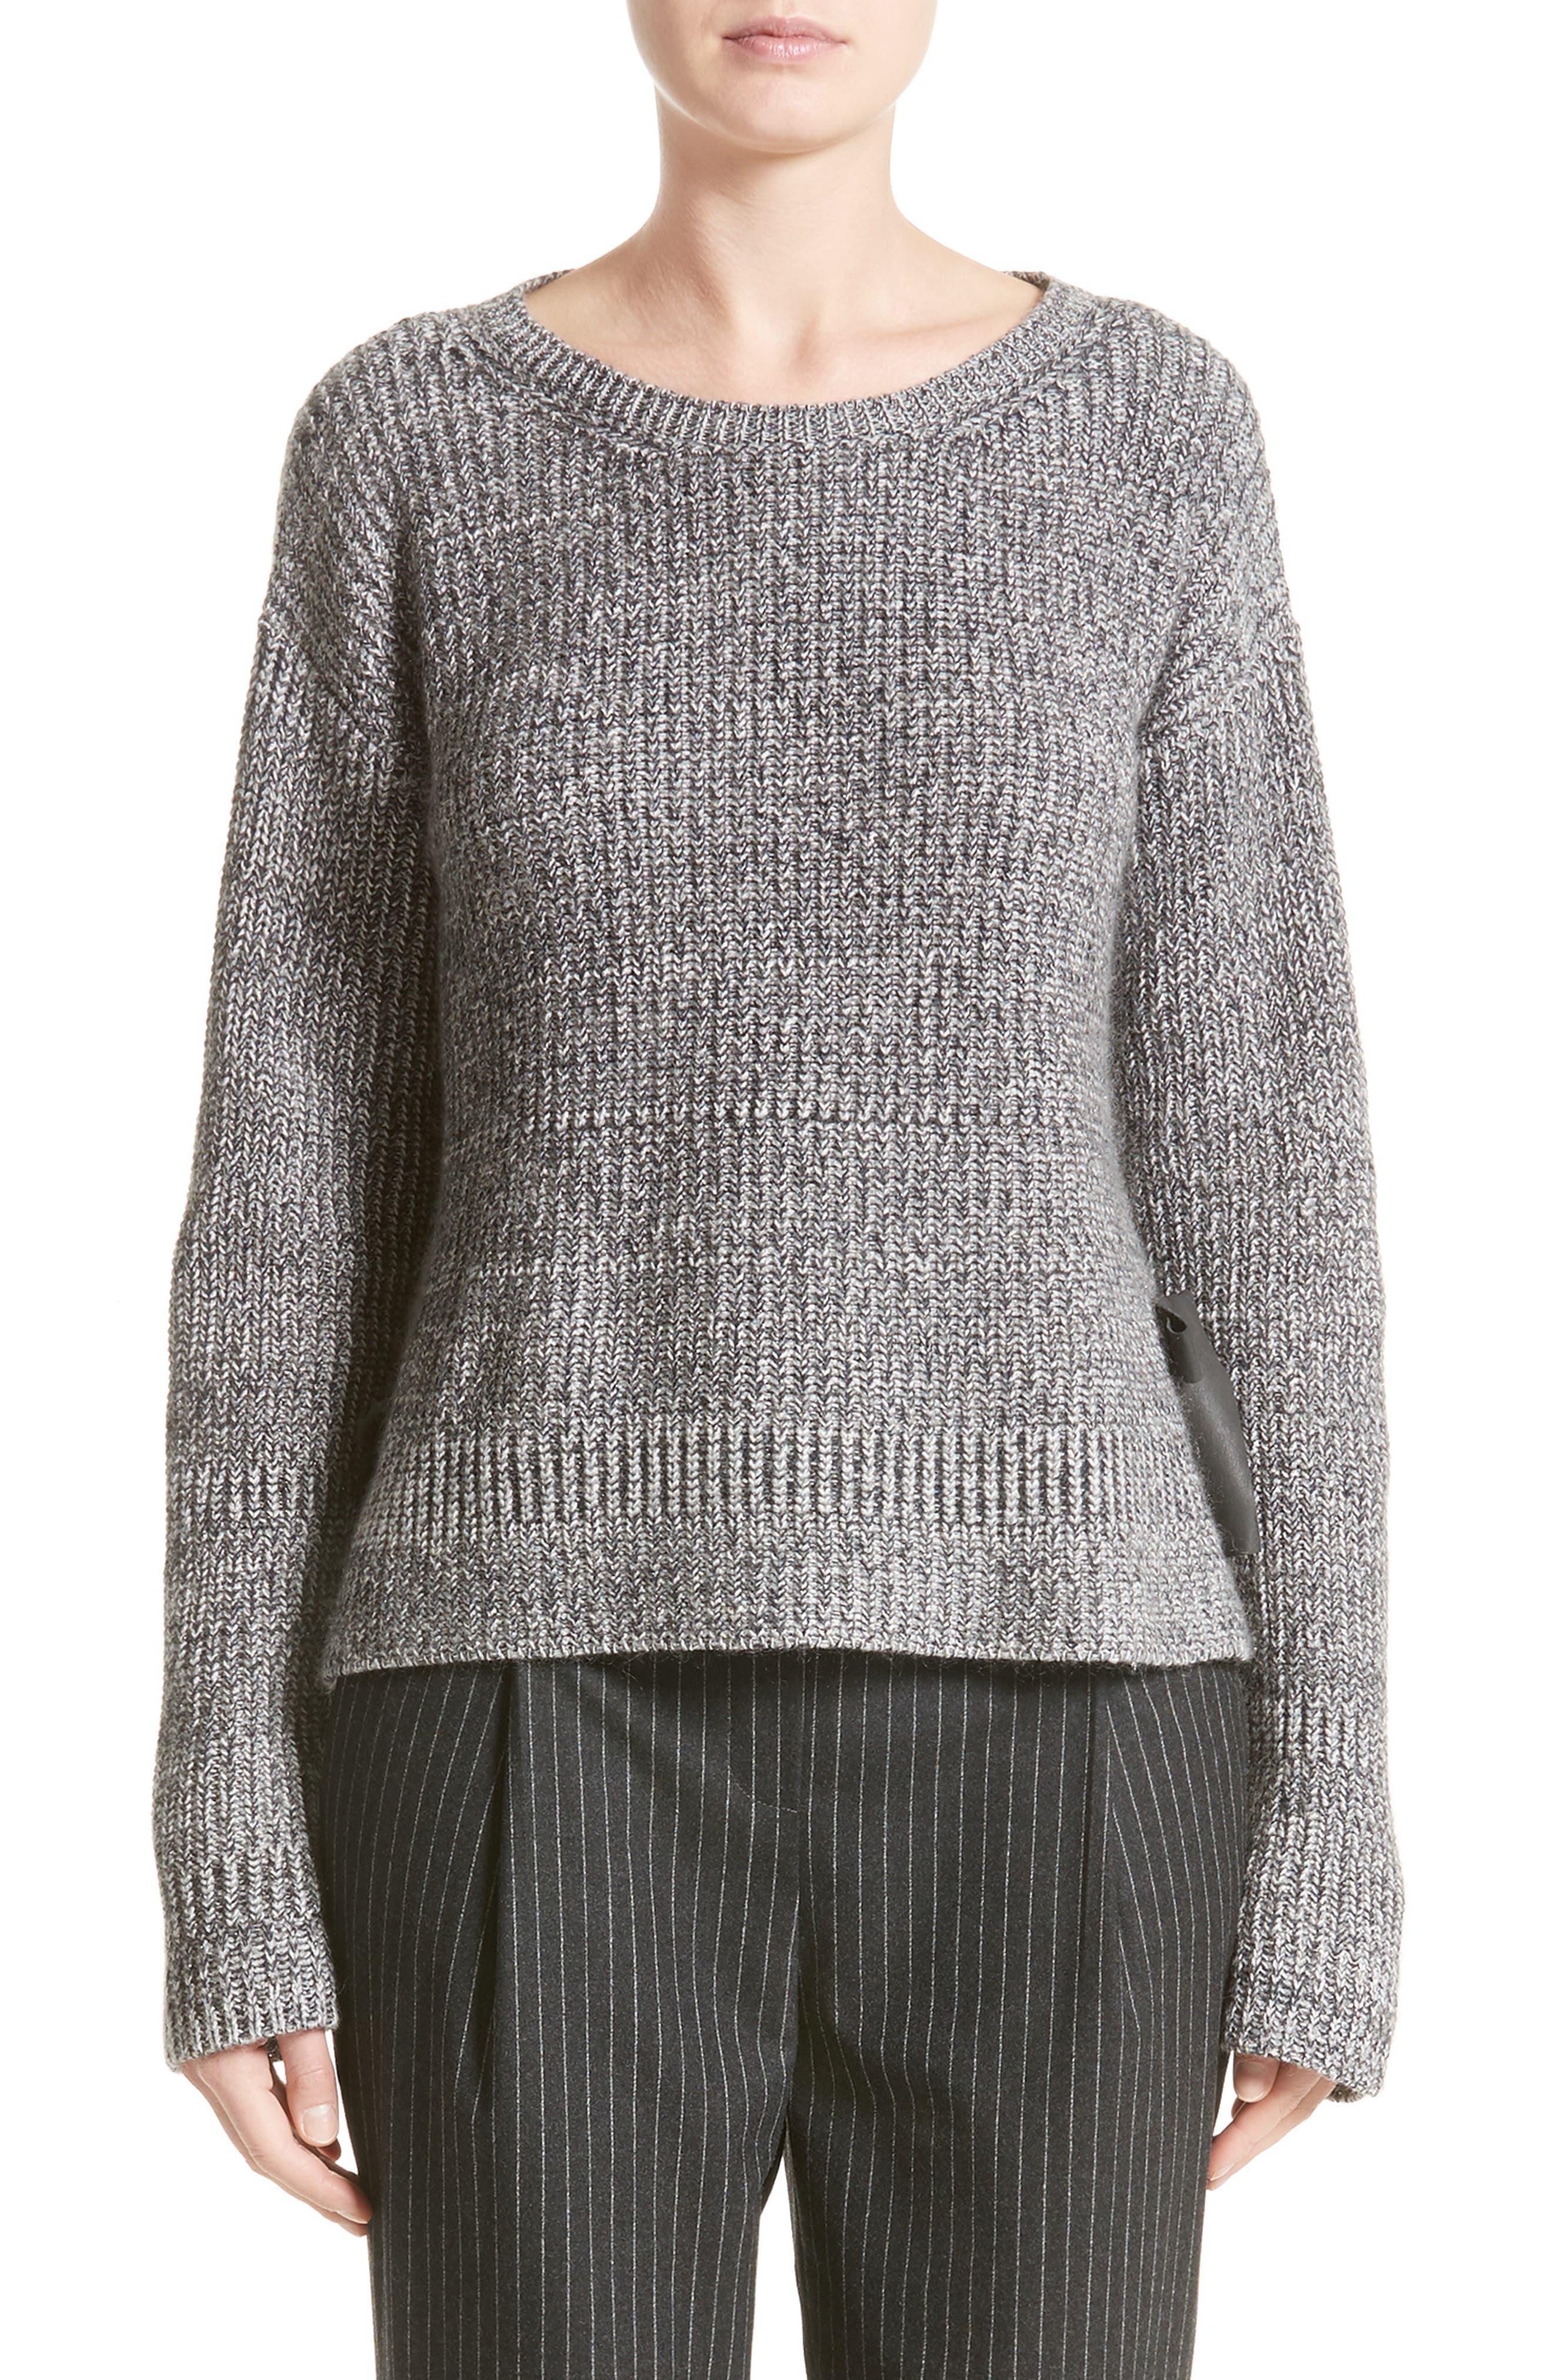 Herringbone Stitch Wool Blend Sweater,                             Main thumbnail 1, color,                             Grey Multi